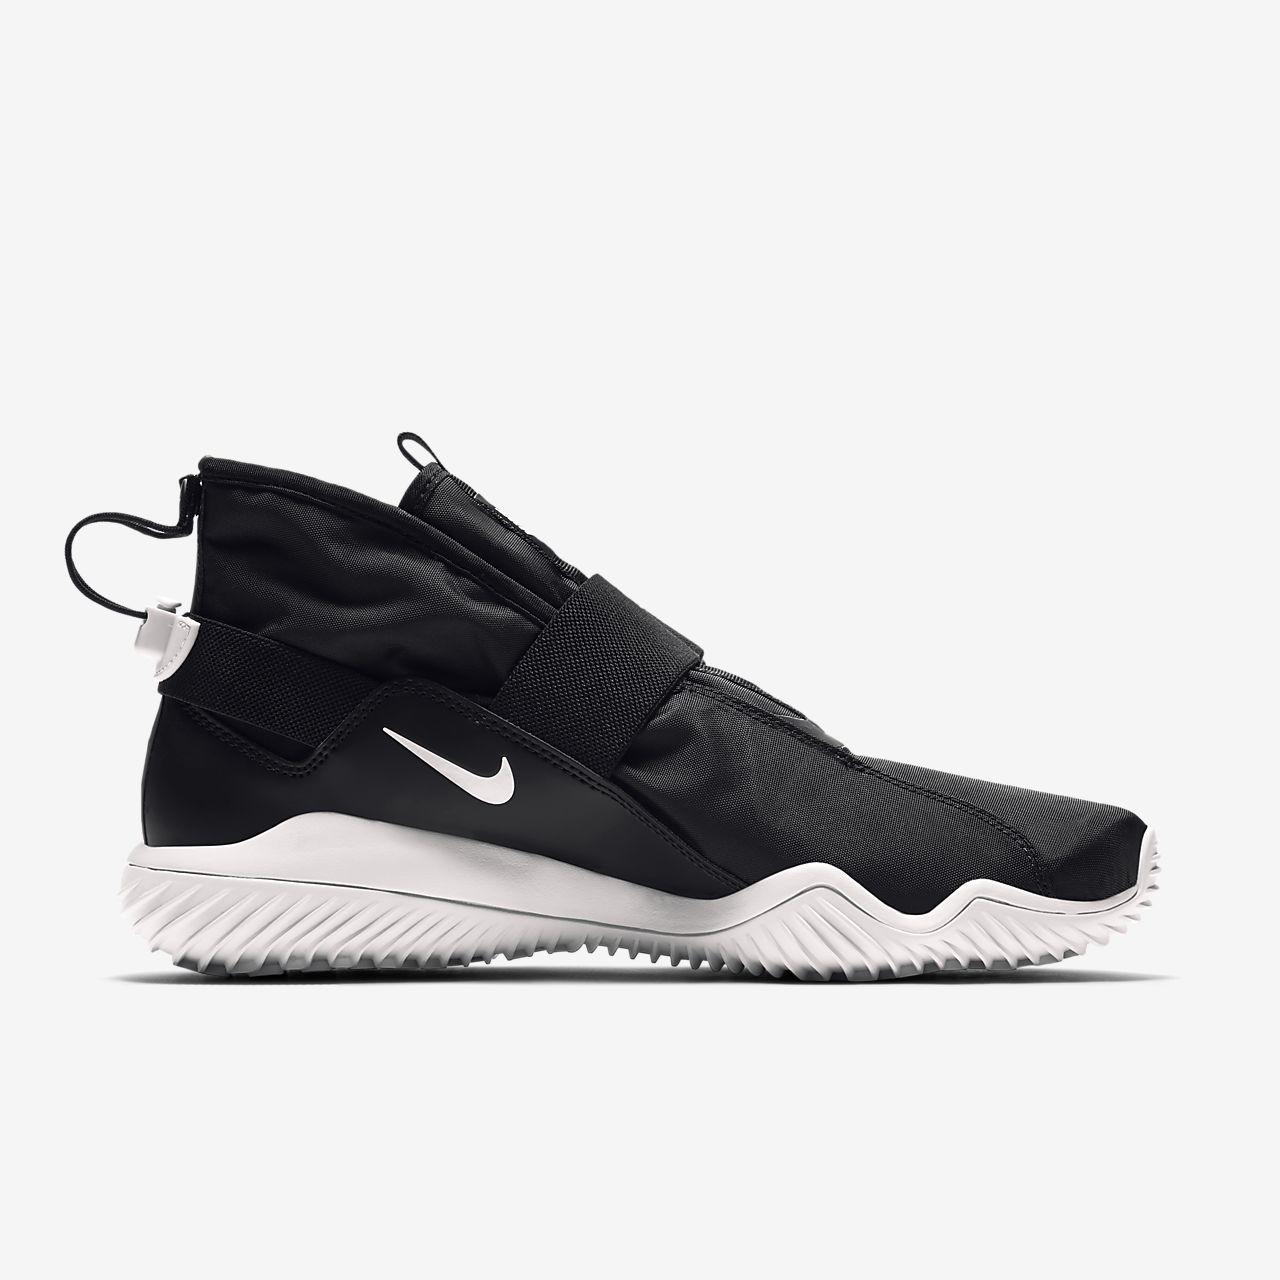 huge discount 1d1d4 e5fd7 Low Resolution Nike Komyuter Mens Shoe Nike Komyuter Mens Shoe